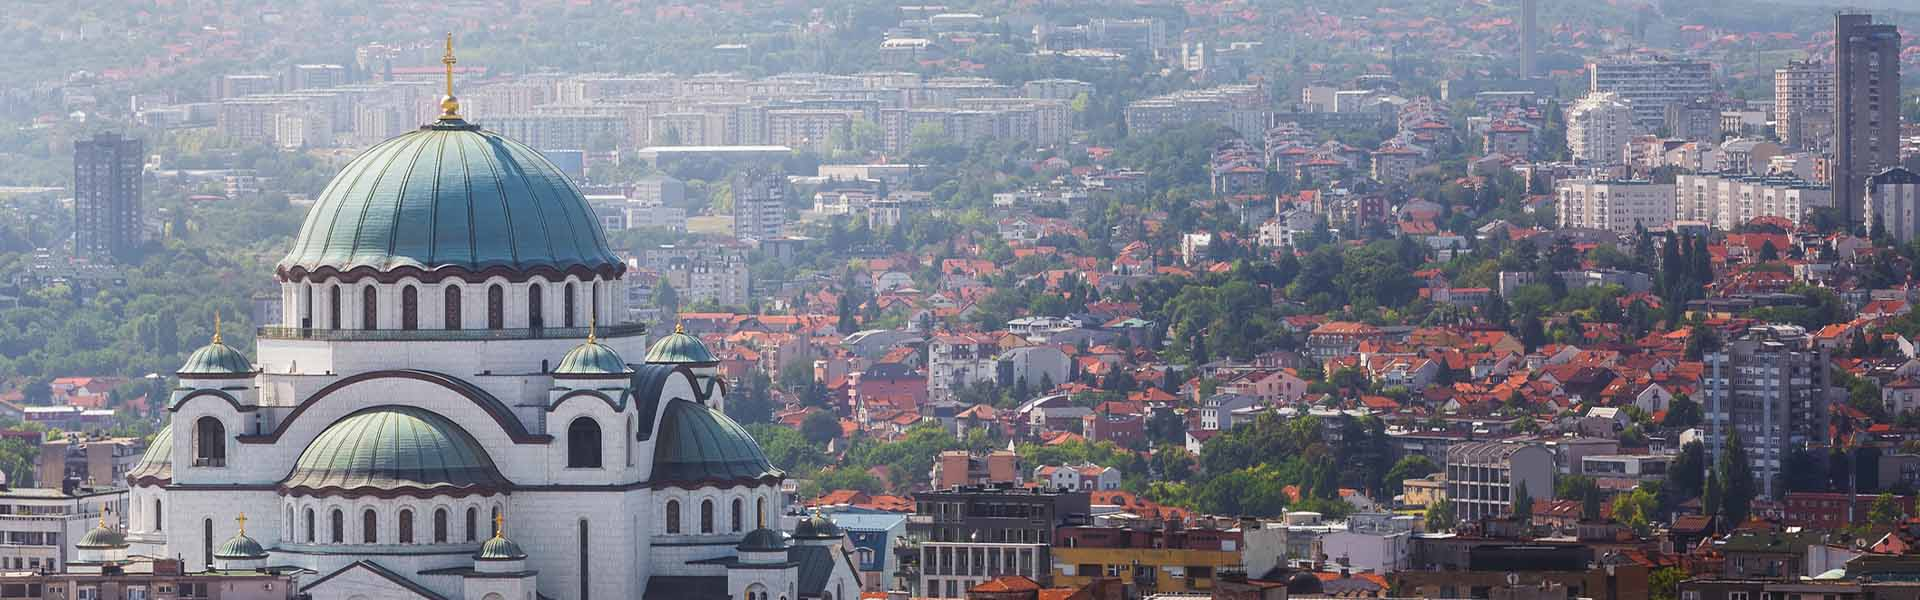 Dostava hrane Vračar | Beograd